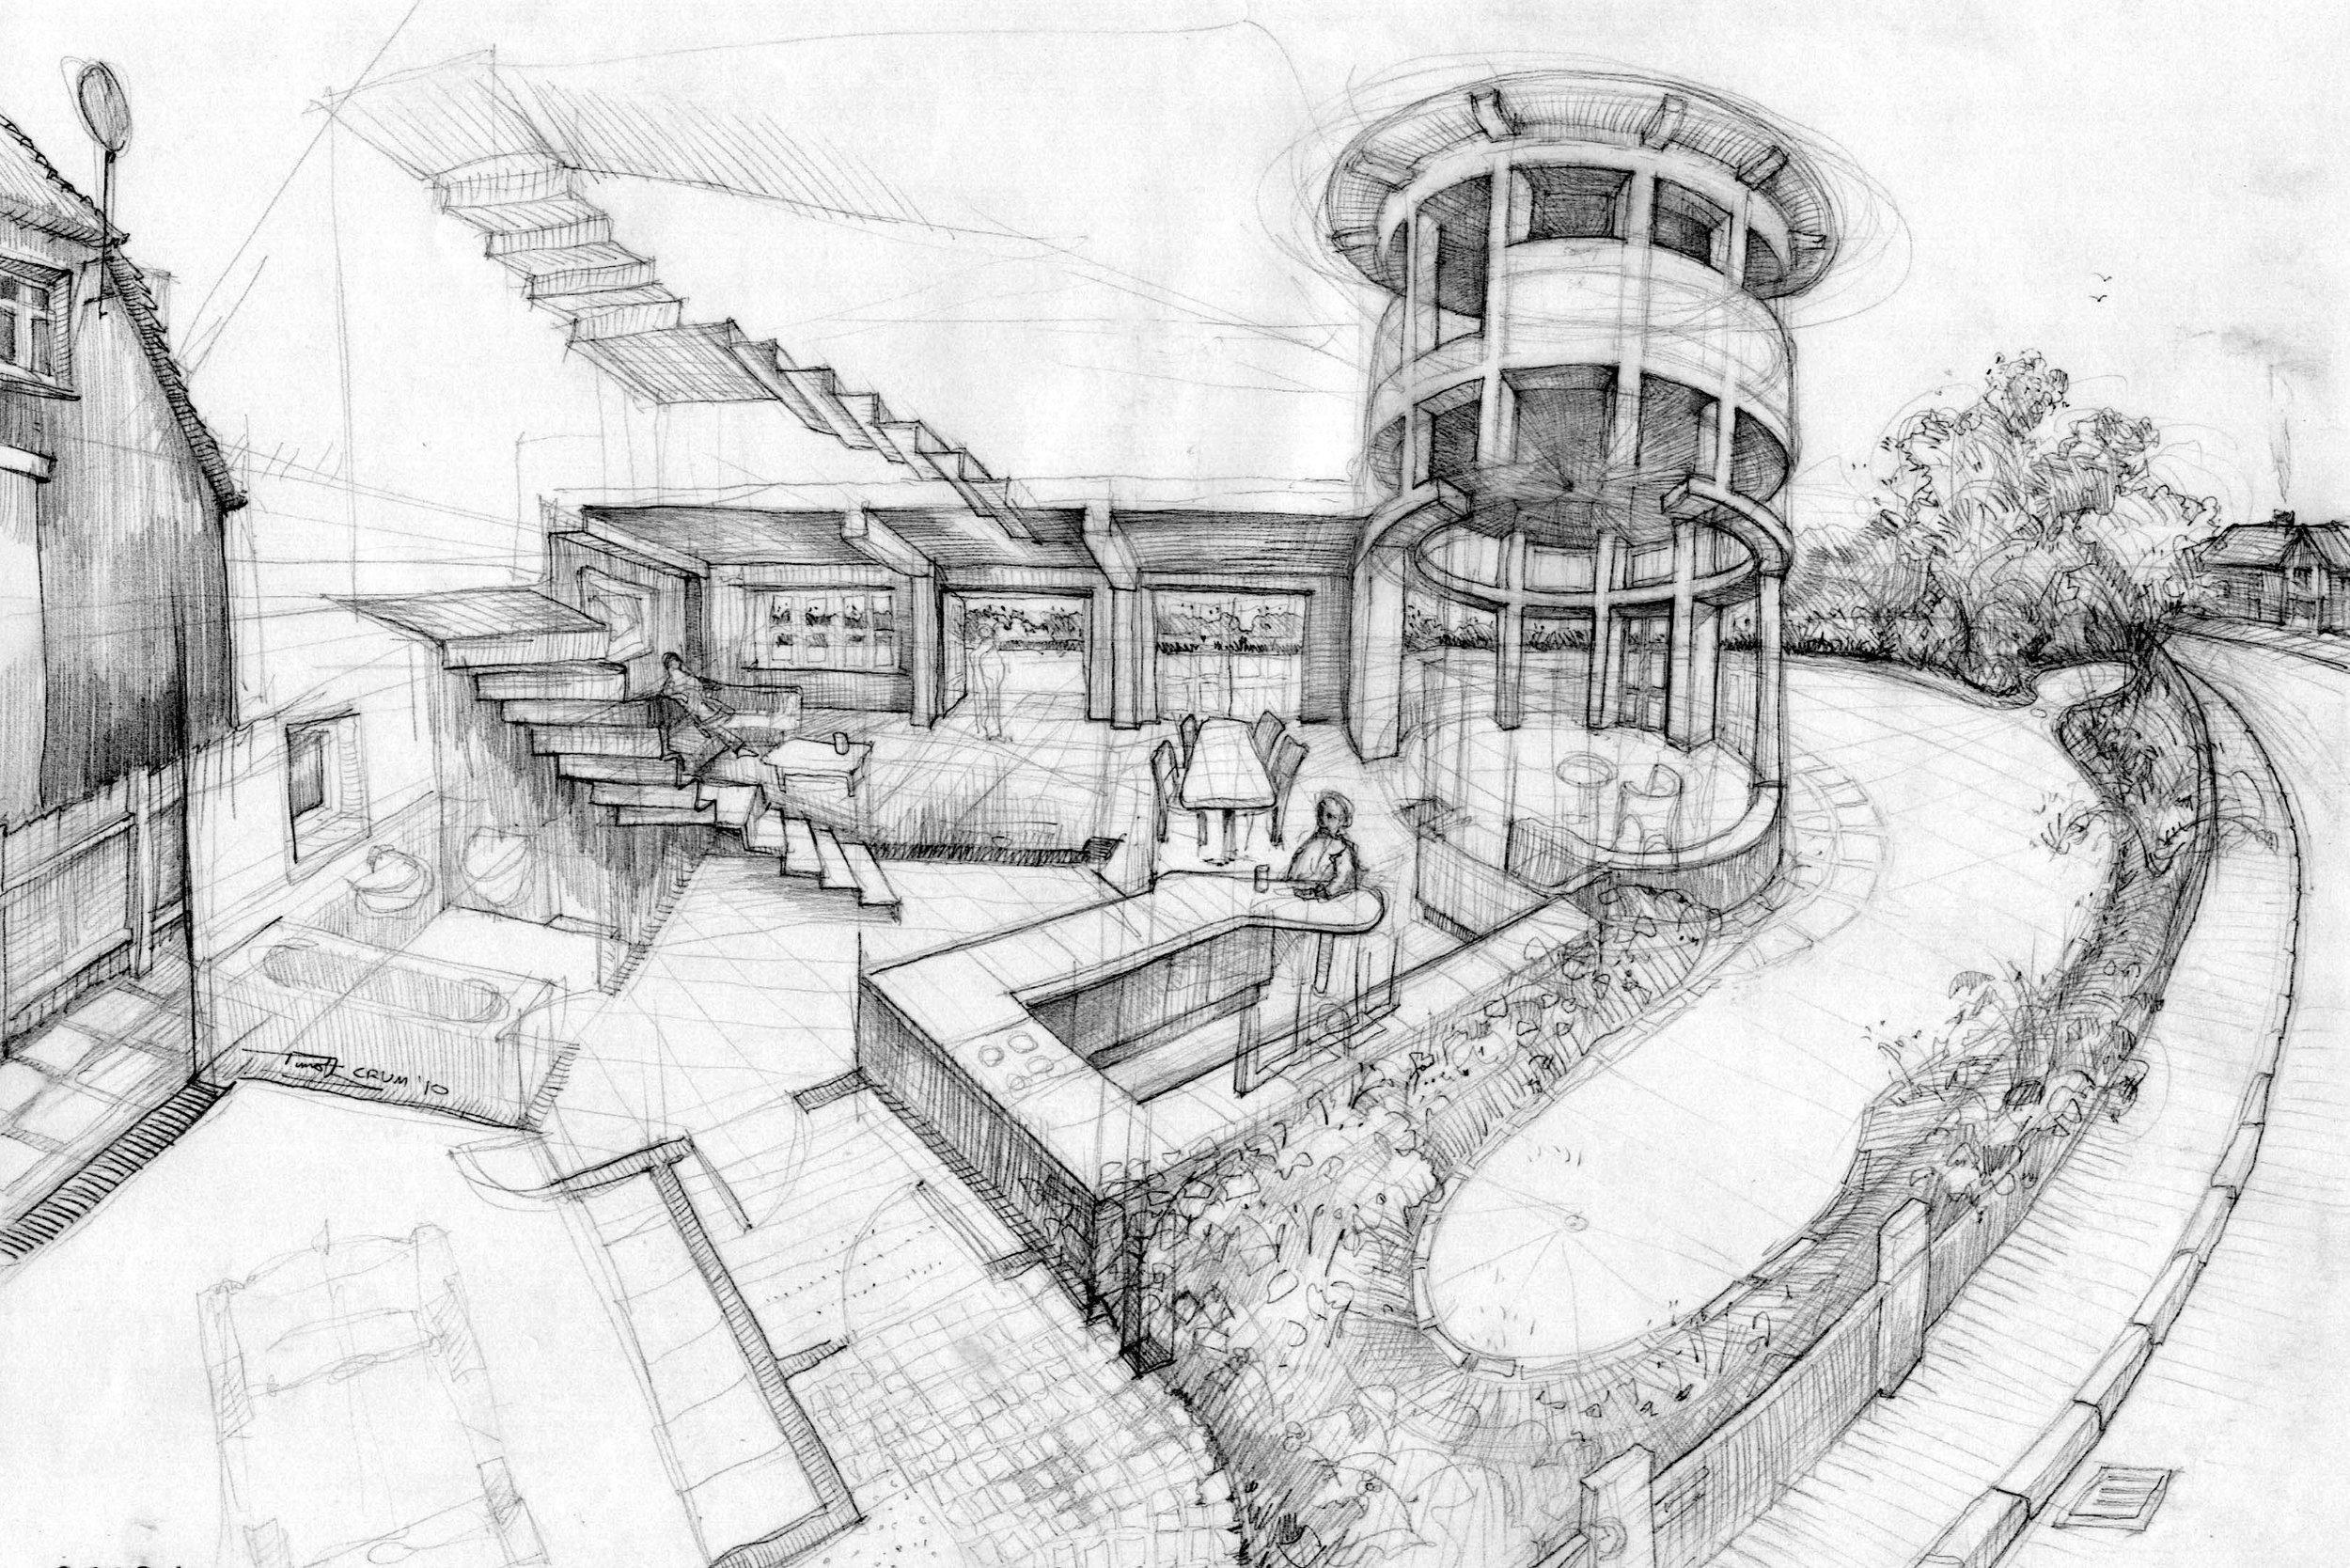 FINEarchitecture_ErnleRoad_Sketch_02.jpeg